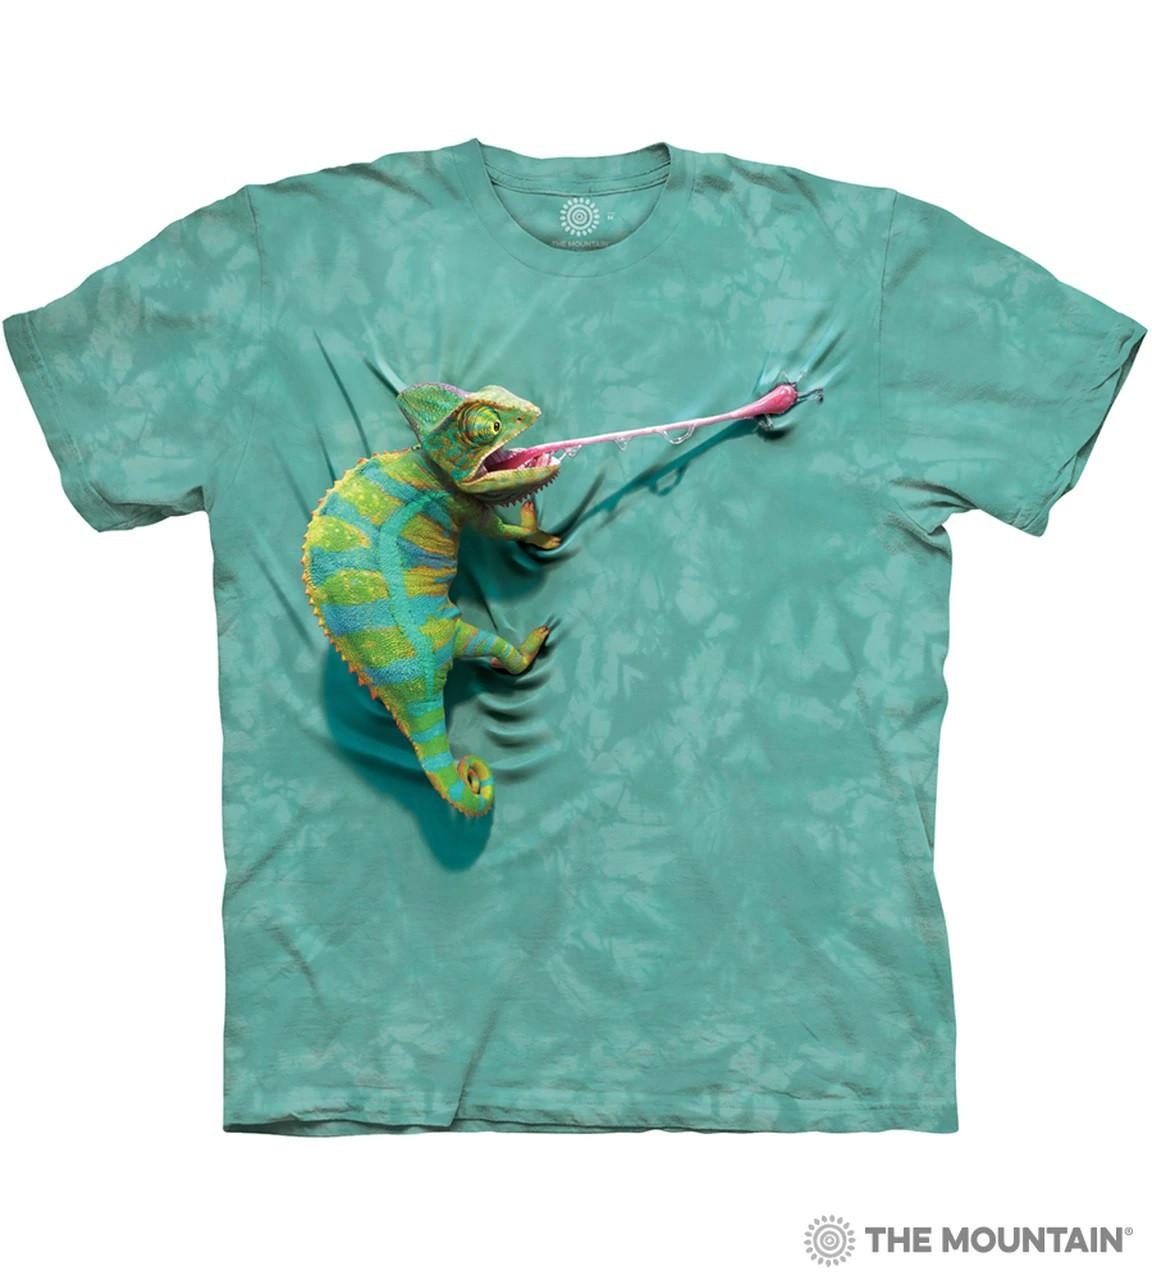 Дитяча футболка THE MOUNTAIN - Climbing Chameleon